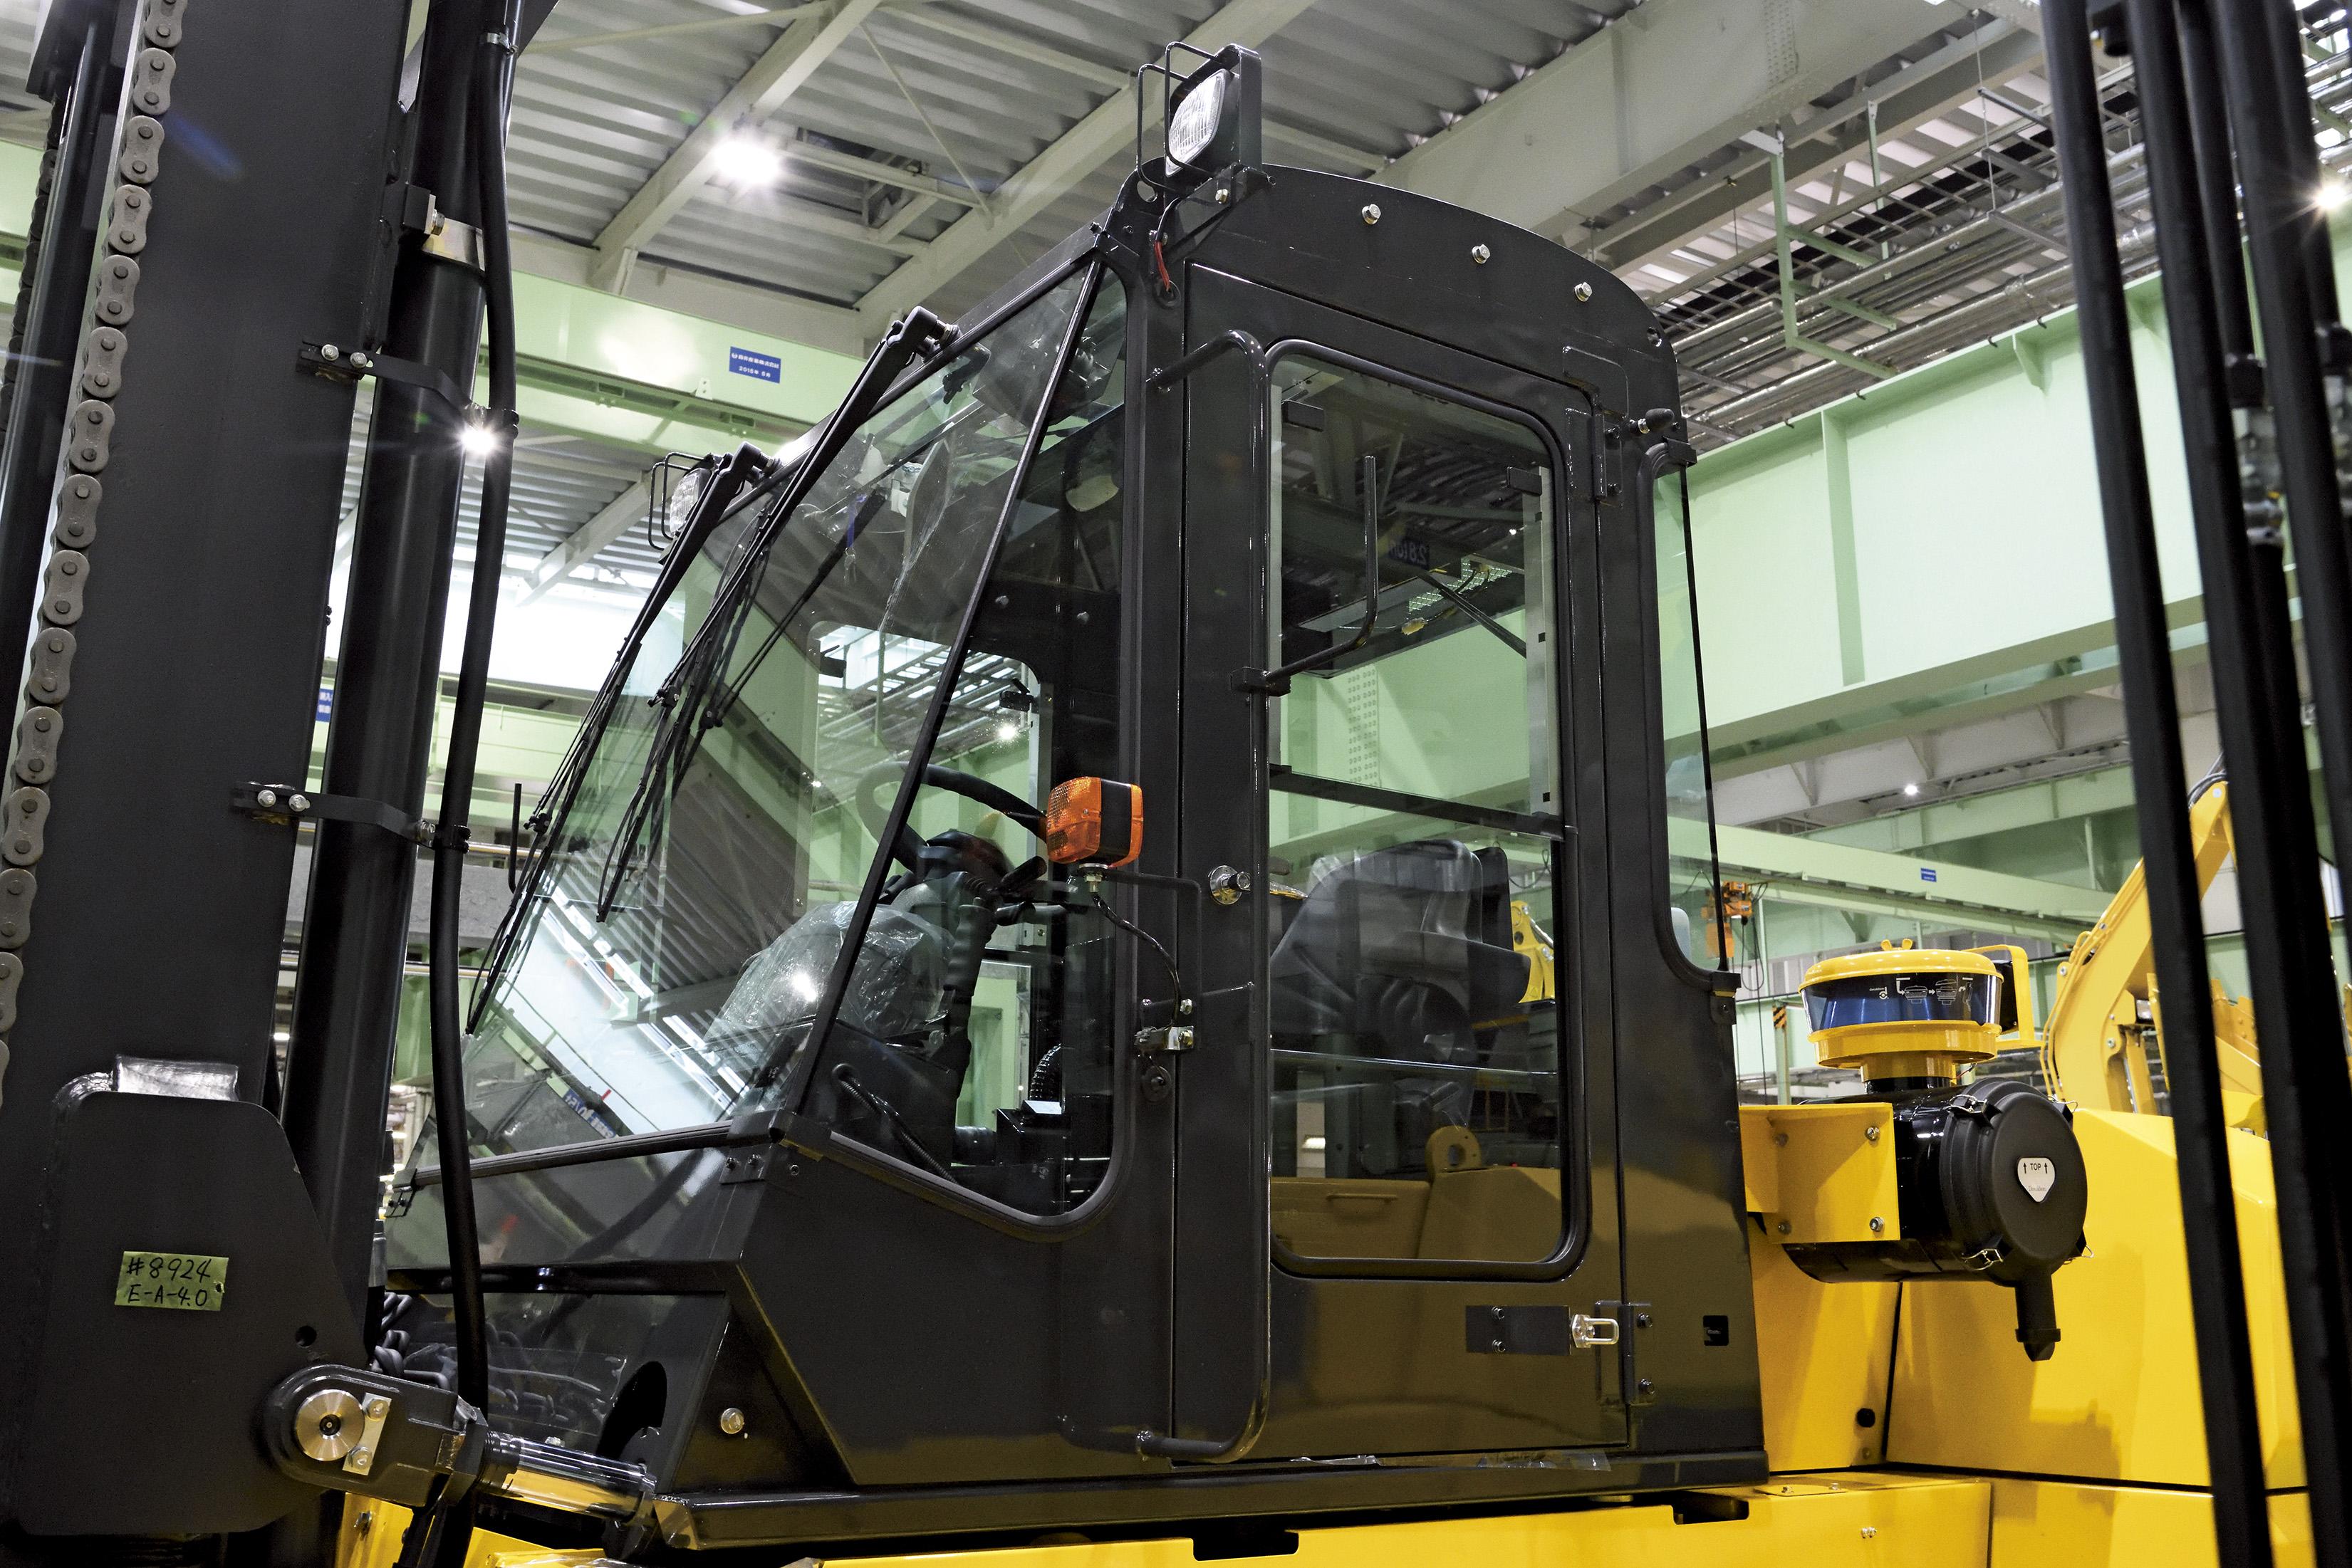 Komatsu EX Series - 10 to 16 Tonne Capacity IC Engine Forklift